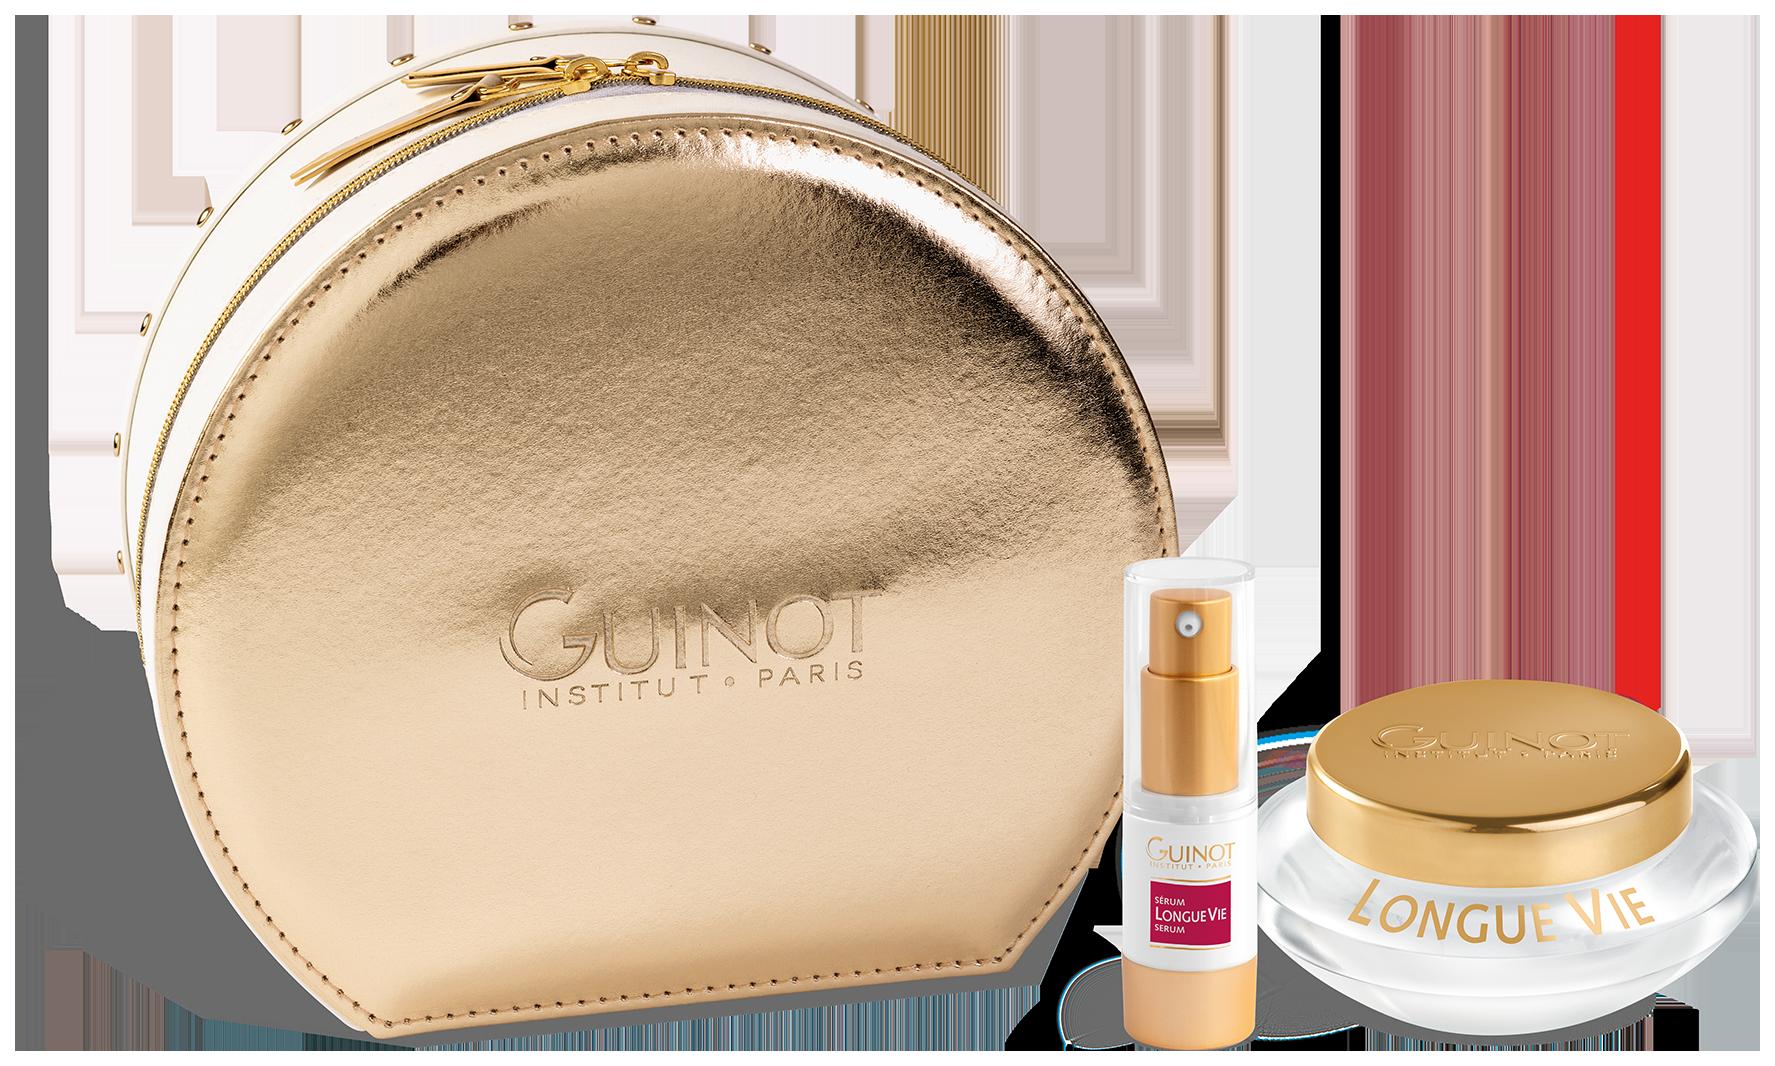 CC - Guinot Coffret Longue Vie - Weihnachts-Geschenkset